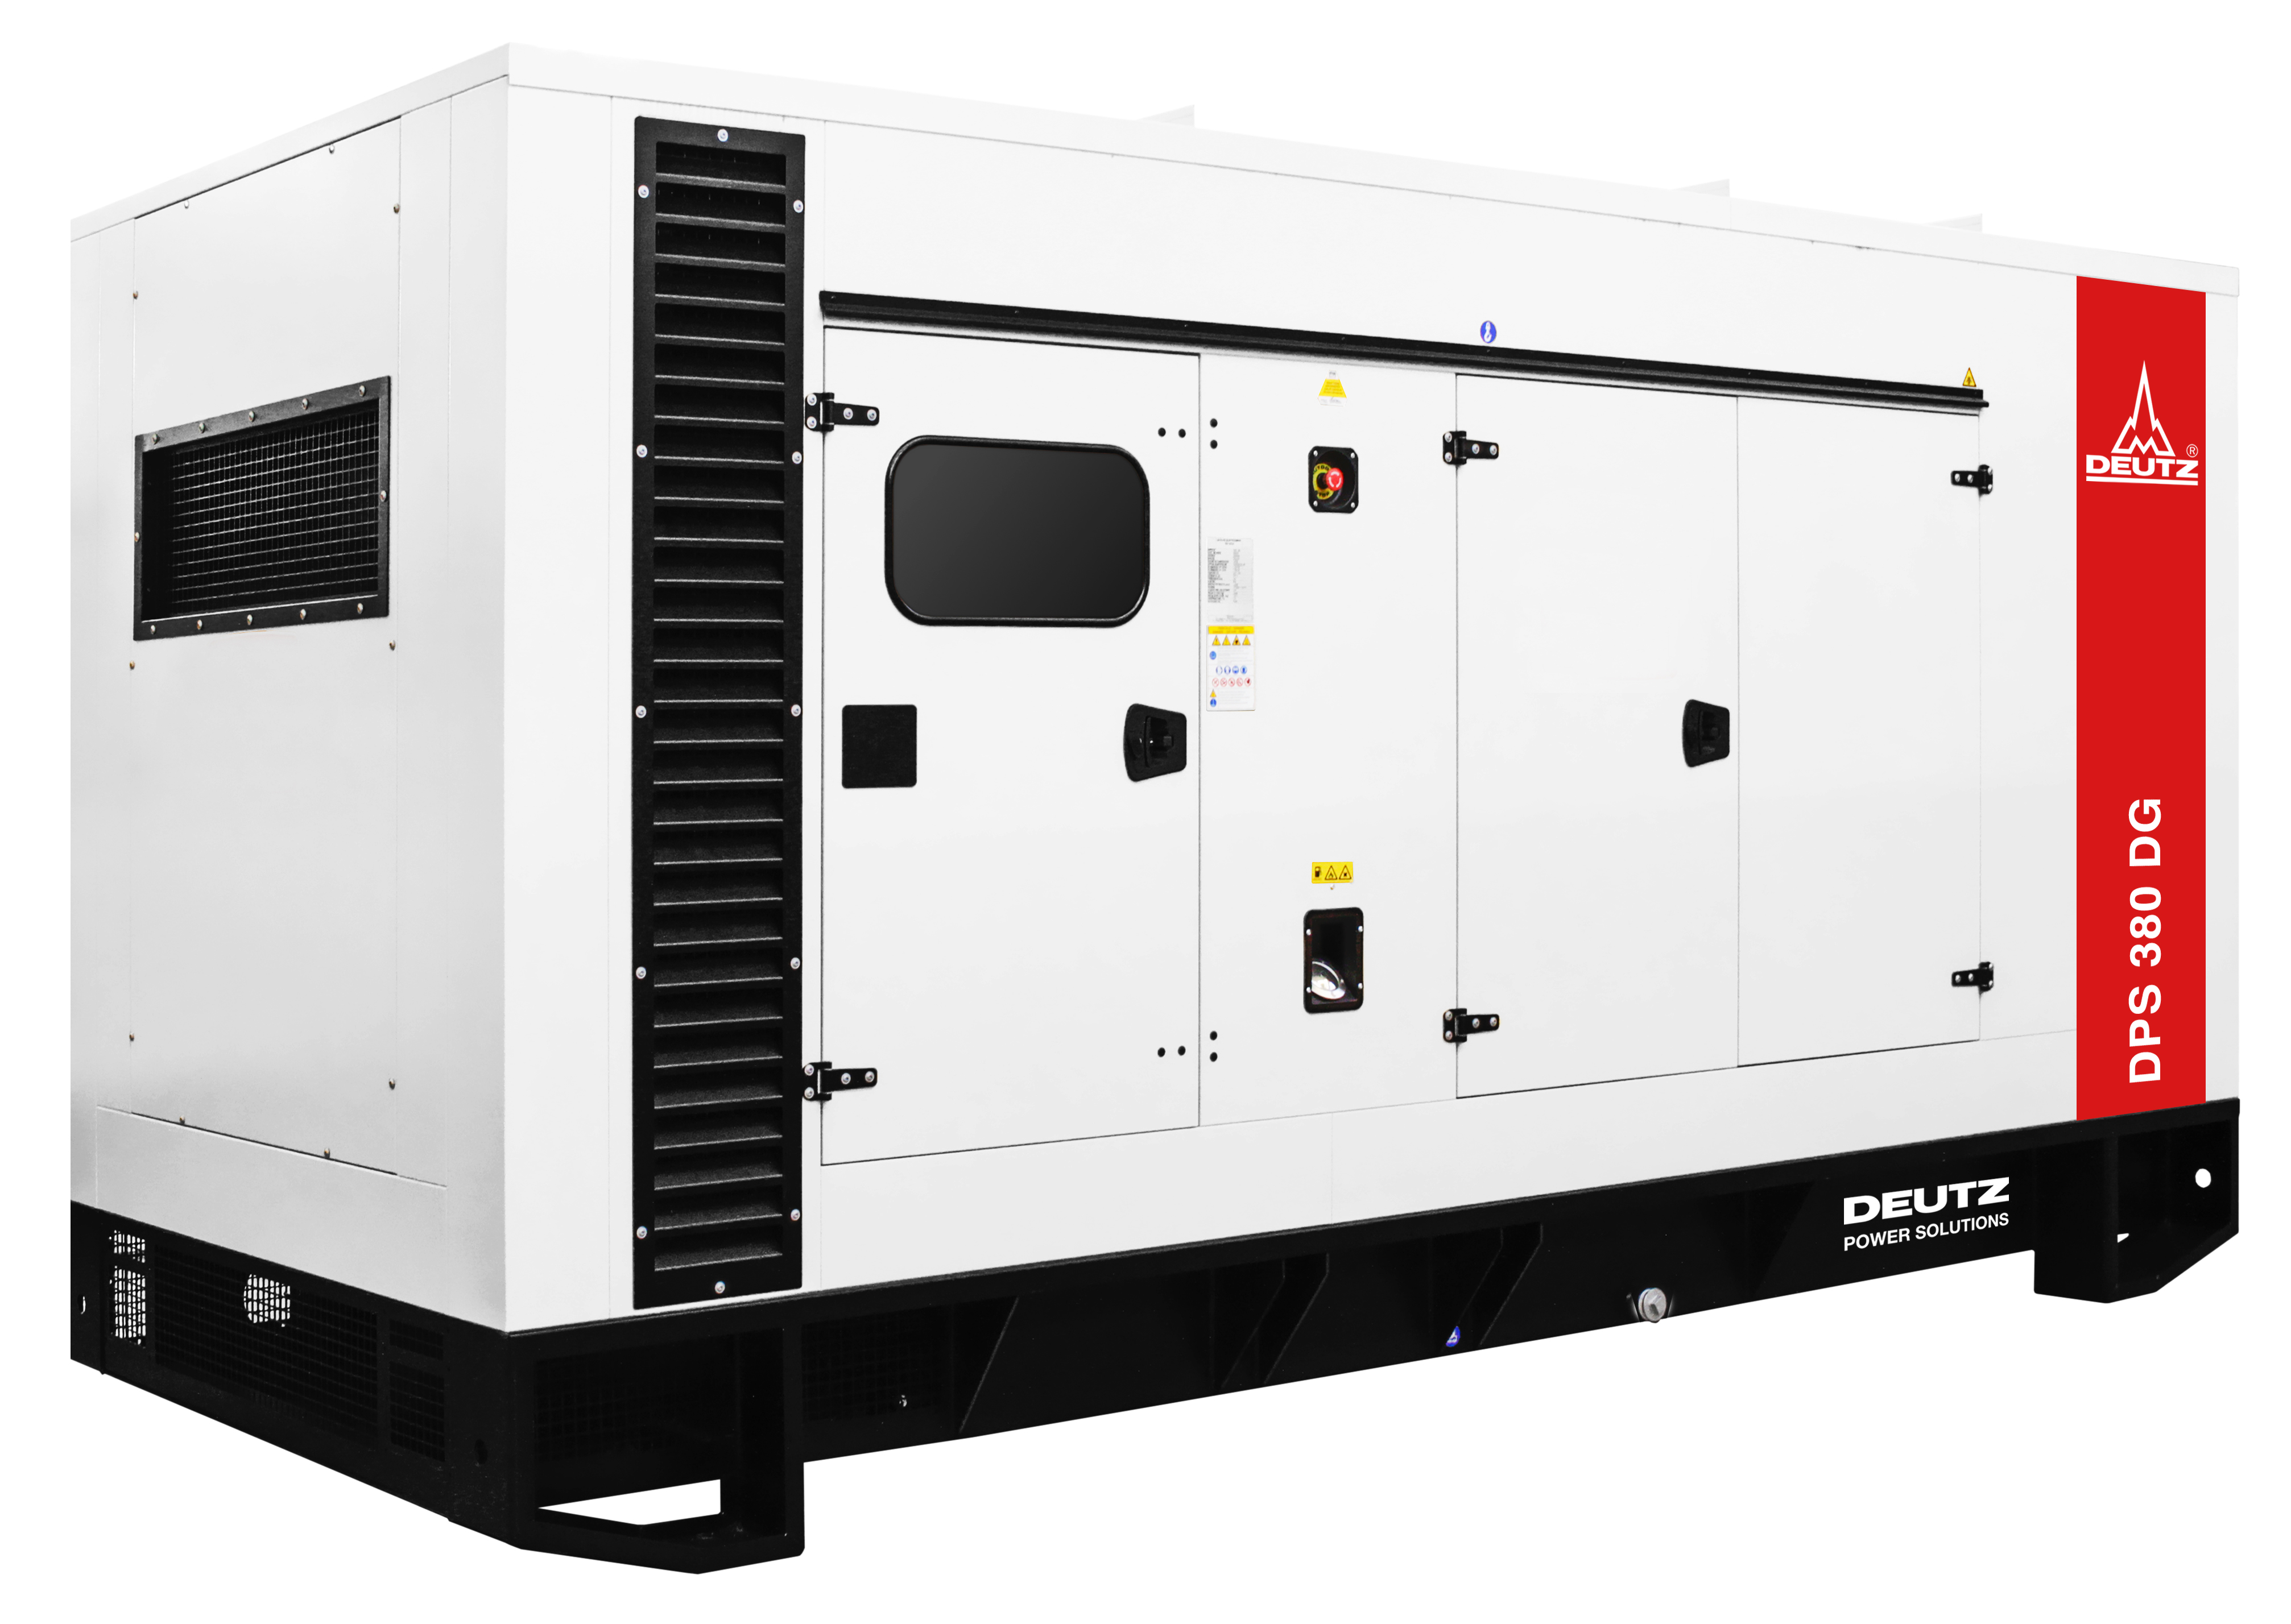 Deutz DPS 380 DG diesel generator